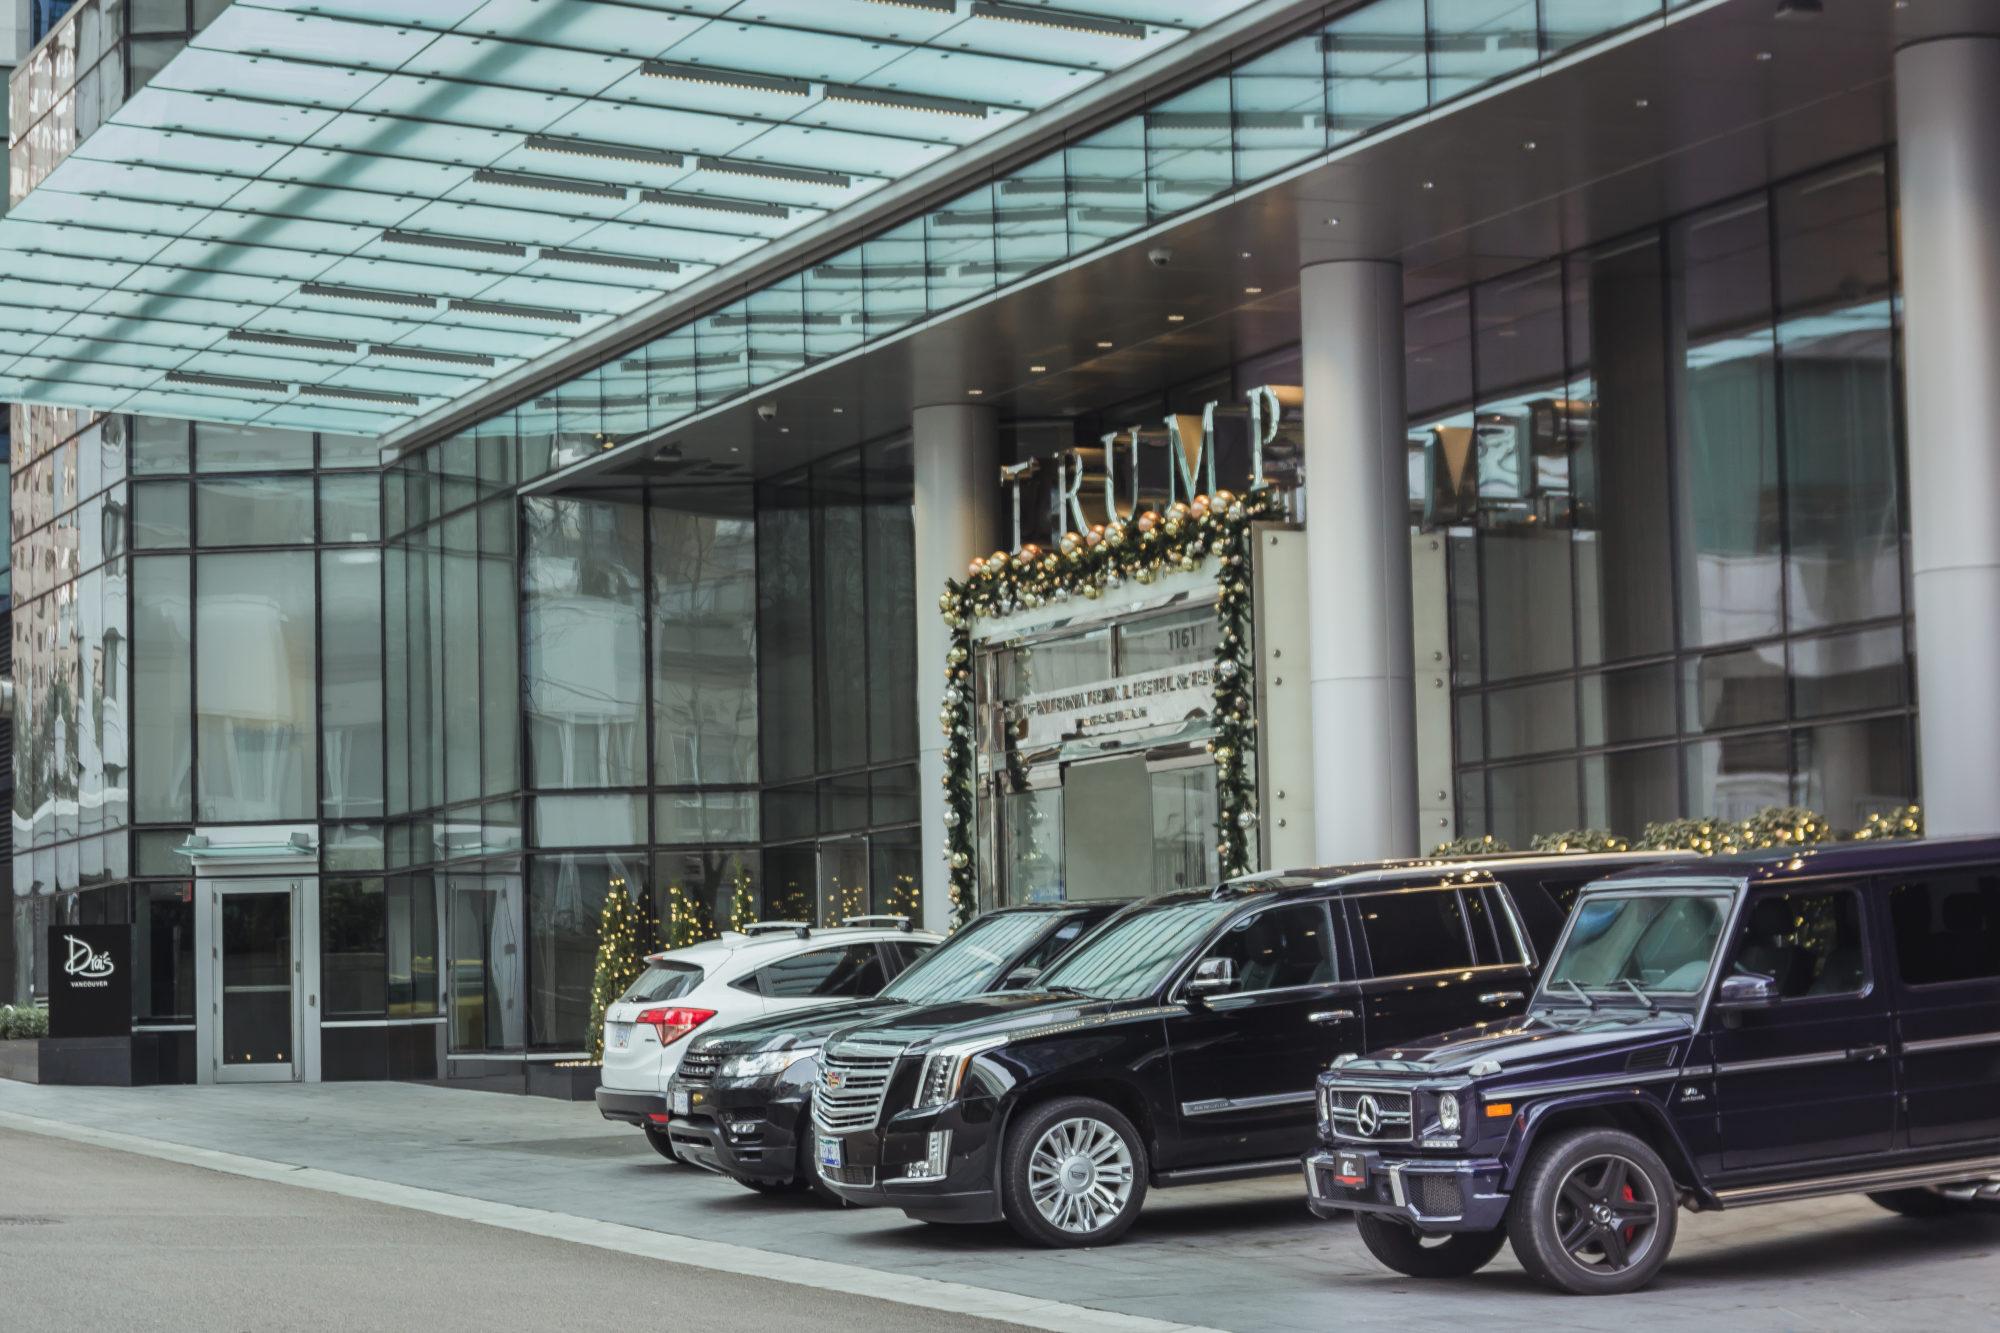 The Trump Vancouver